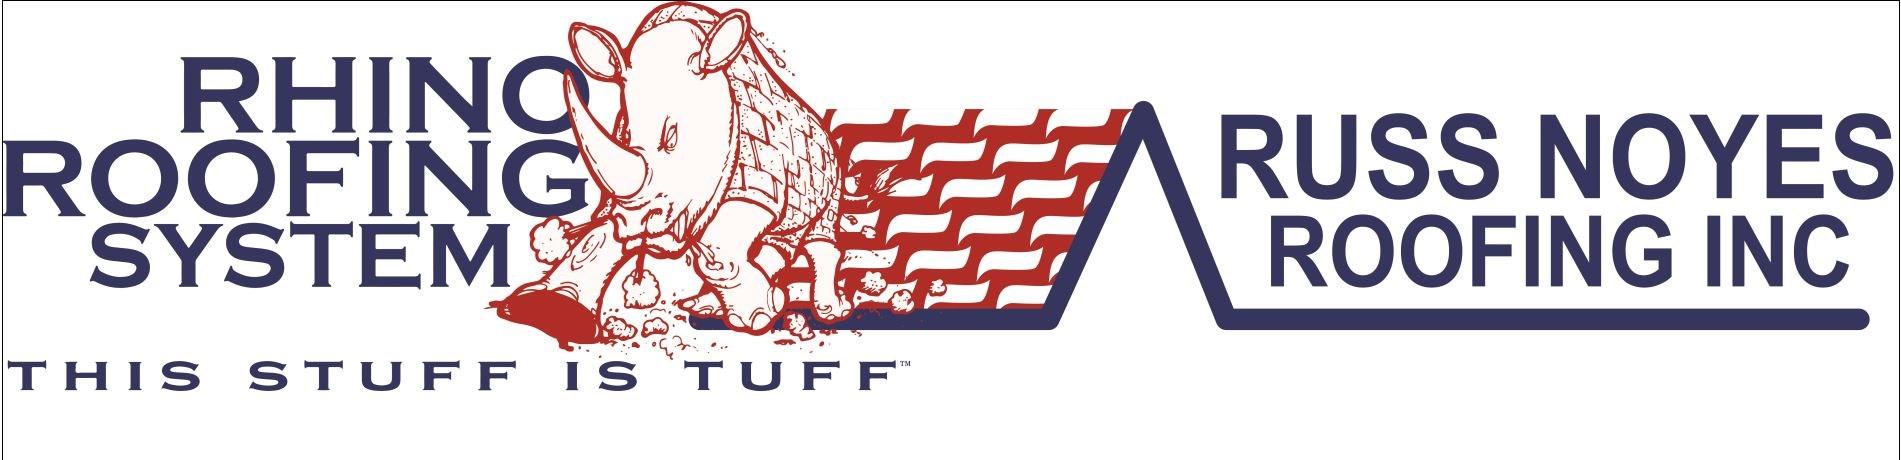 Russ Noyes Roofing Inc logo